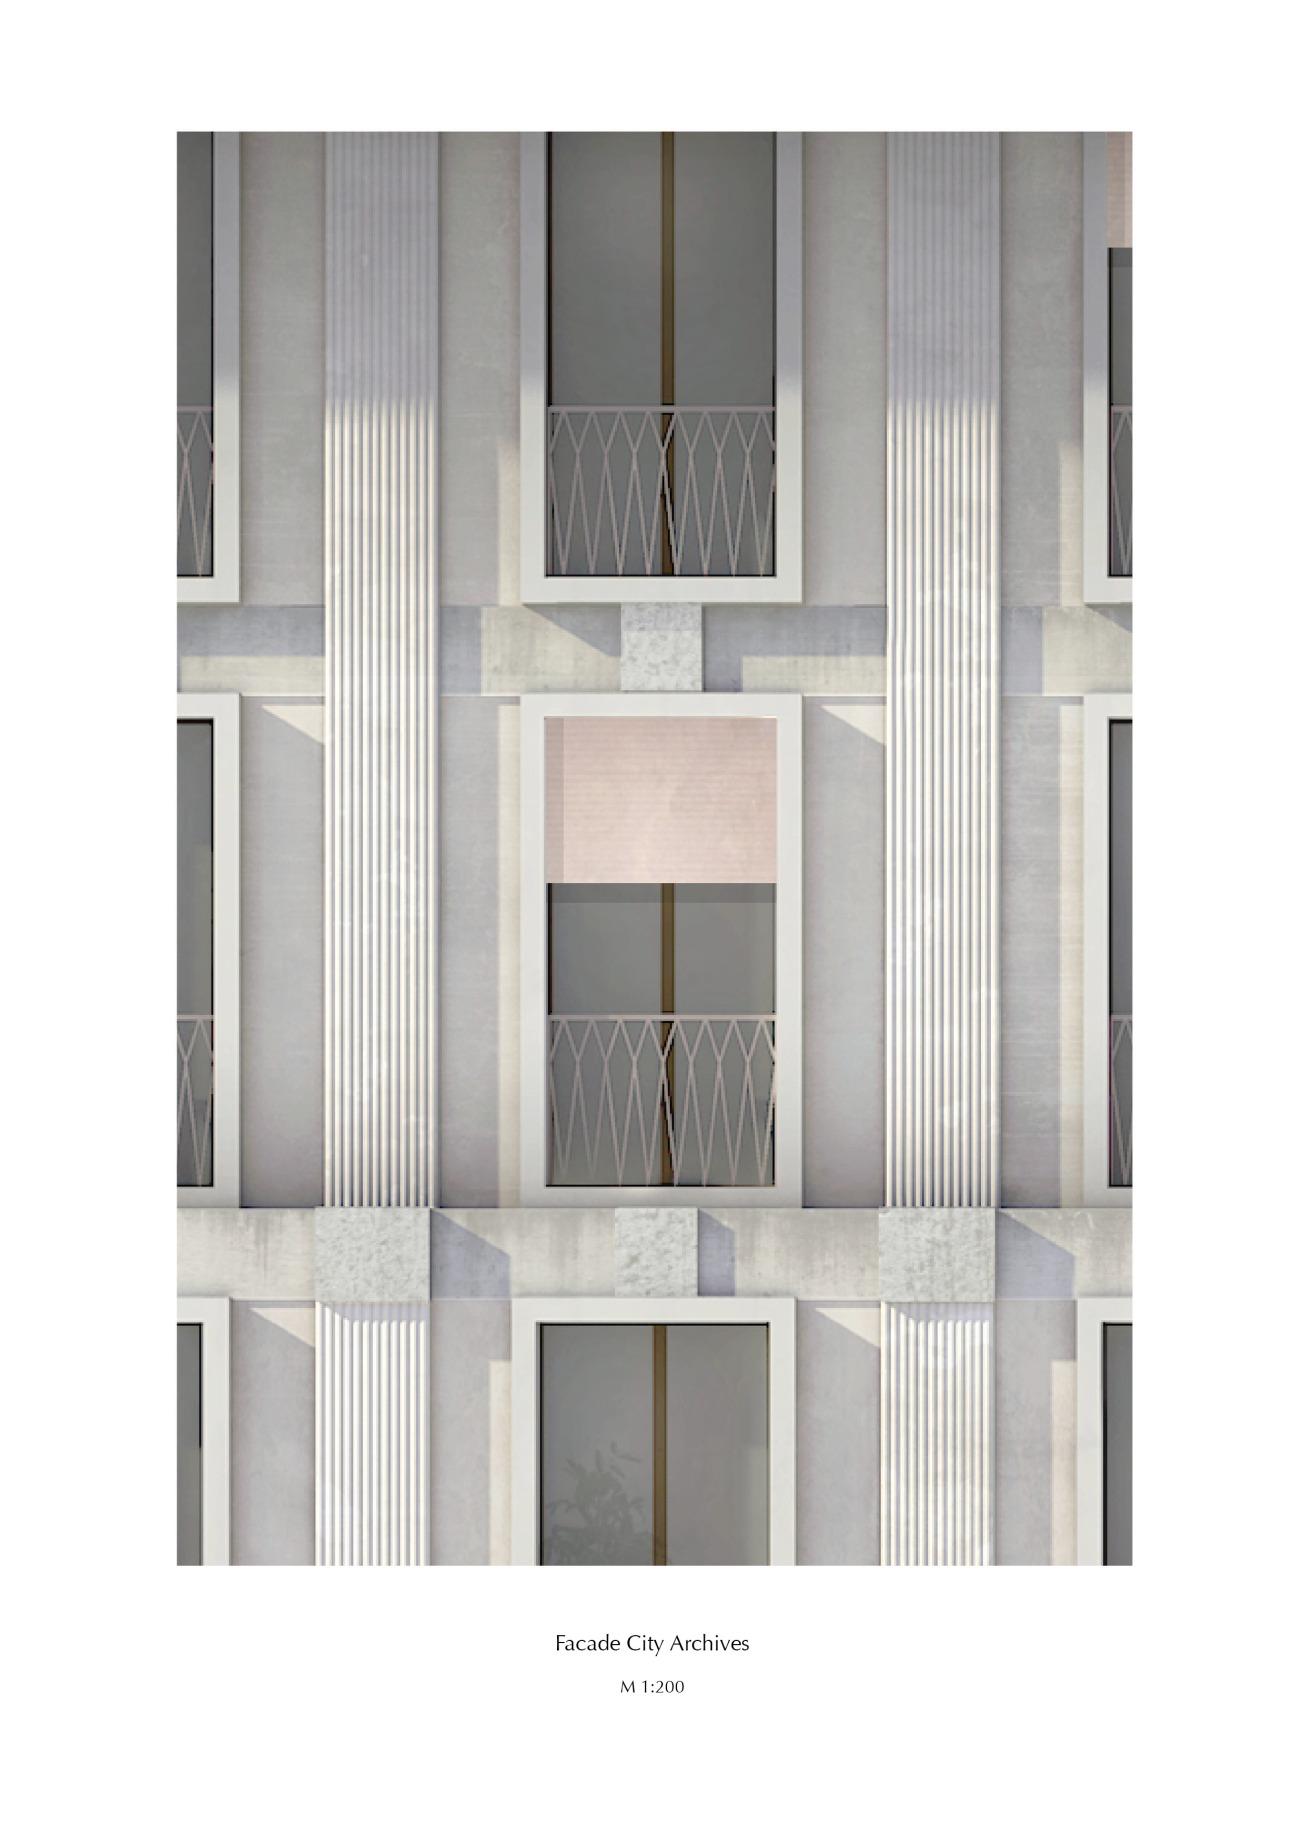 Megastructures -Reuse and Extension Karstadt Munich, Lena Teresa Kohl, Master Thesis, (2016, Technical University of Munich) 18